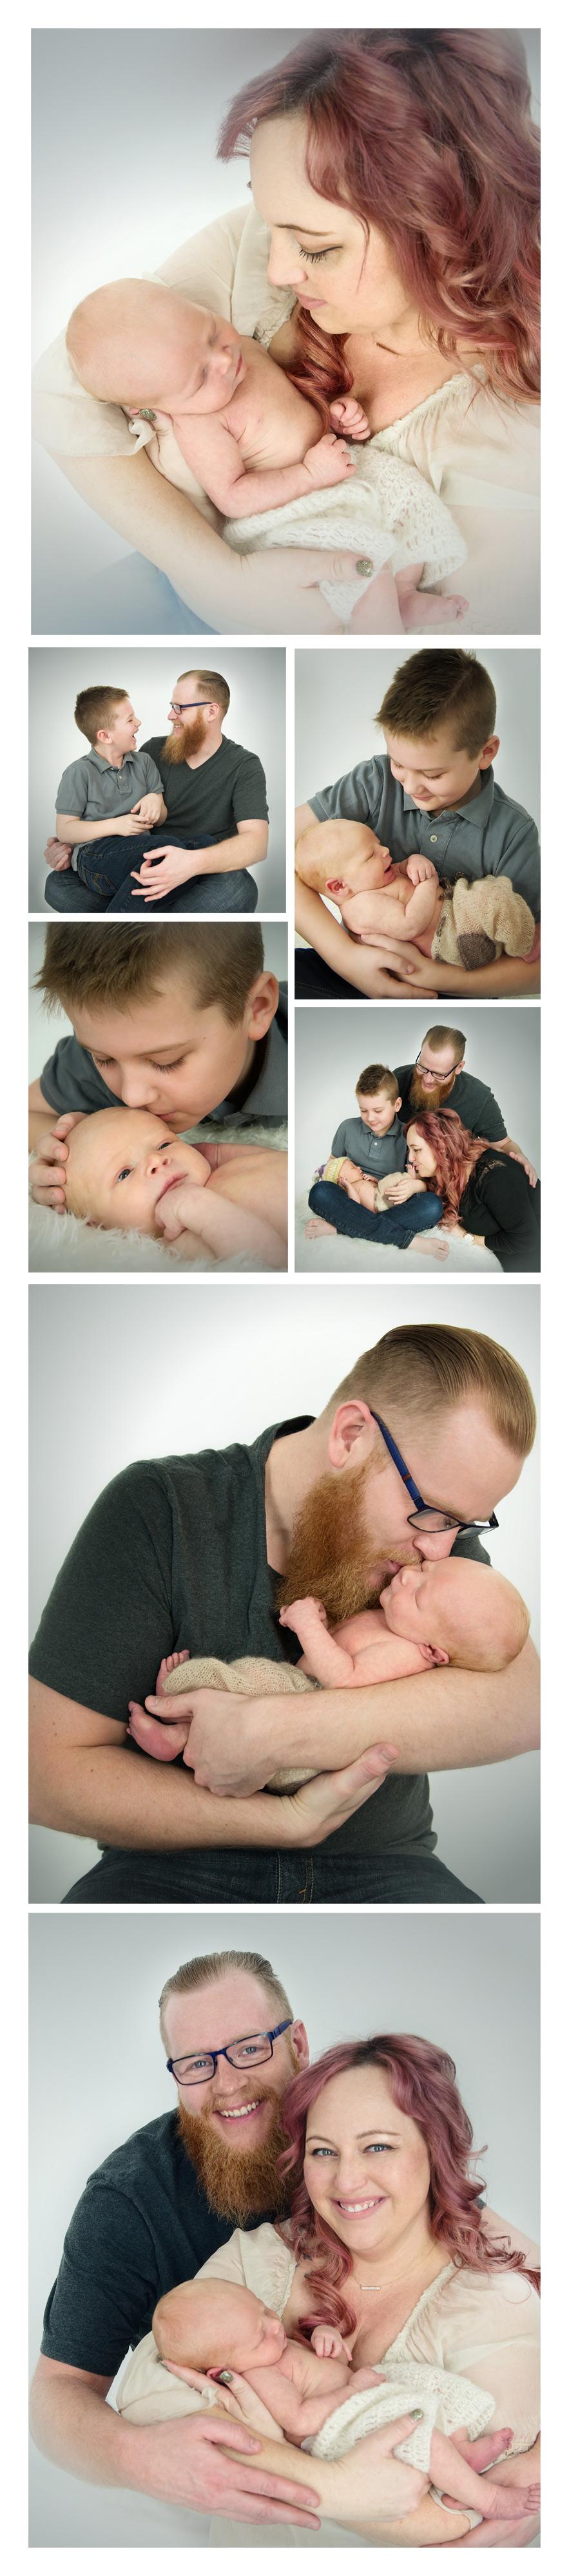 regina-newborn-photographer-heart-full-of-love-02.jpg